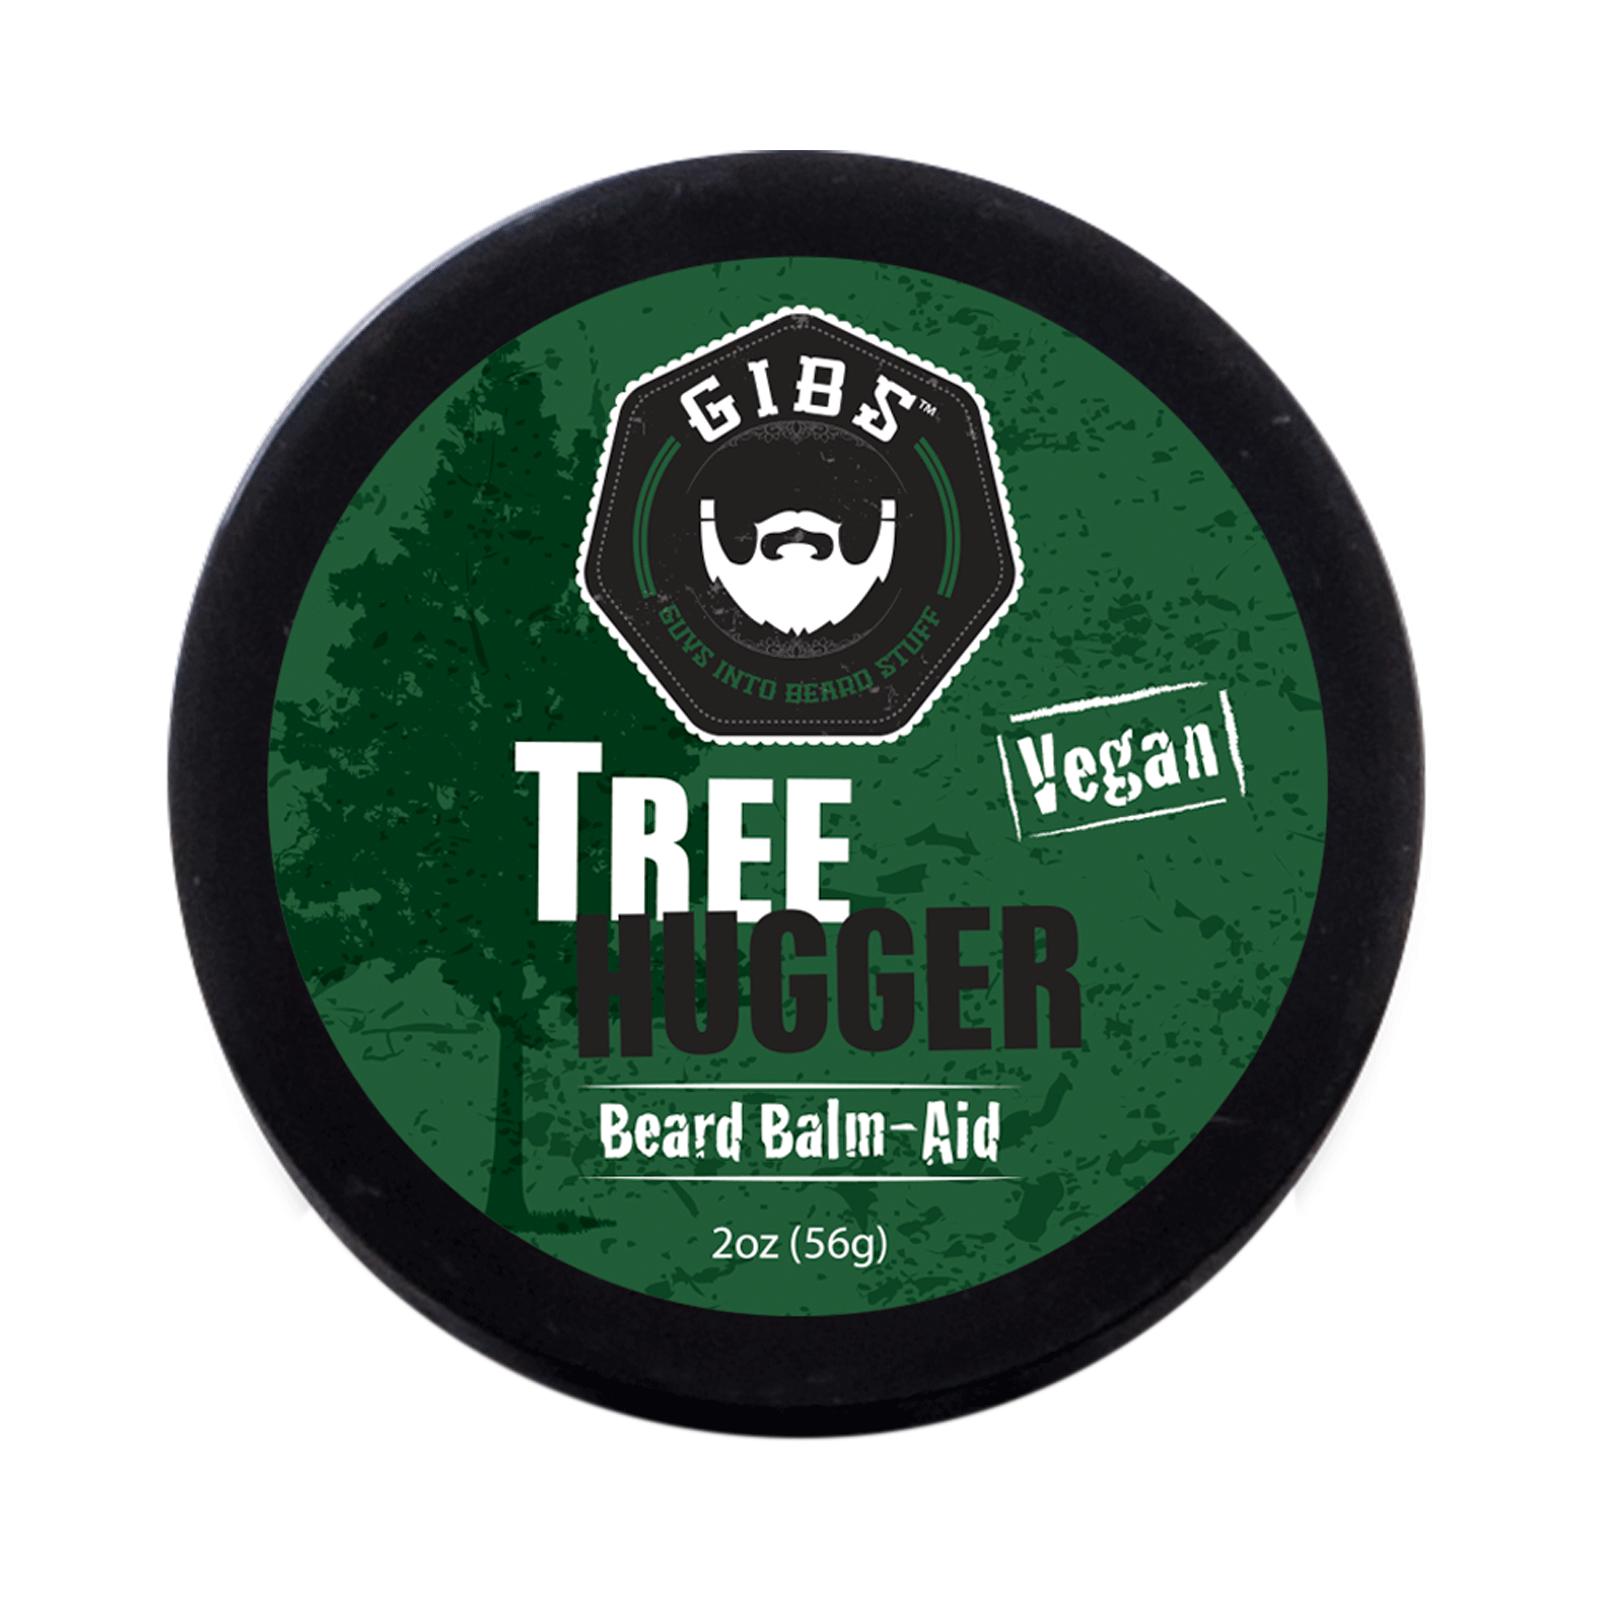 GIBS Grooming Tree Hugger Vegan Beard Balm, 2oz